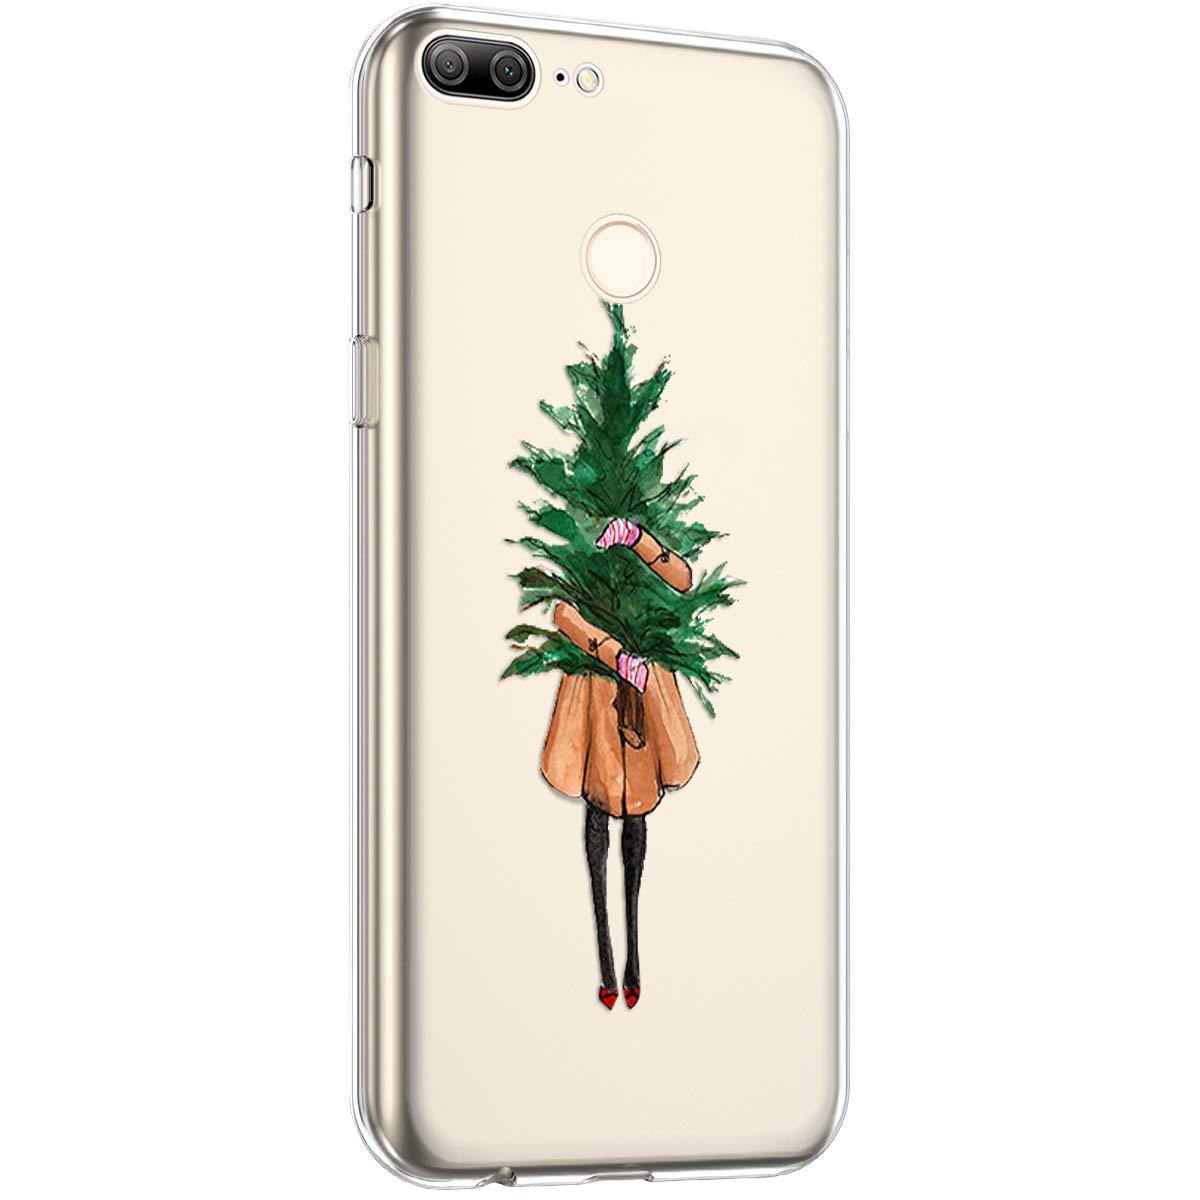 Surakey Silikon H/ülle f/ür Huawei Honor 9 Lite H/ülle,Xmas Christmas Weihnachten Schneeflocke Muster Ultra D/ünn Durchsichtig TPU Silikon Handyh/ülle Schutzh/ülle Case Cover f/ür Huawei Honor 9 Lite